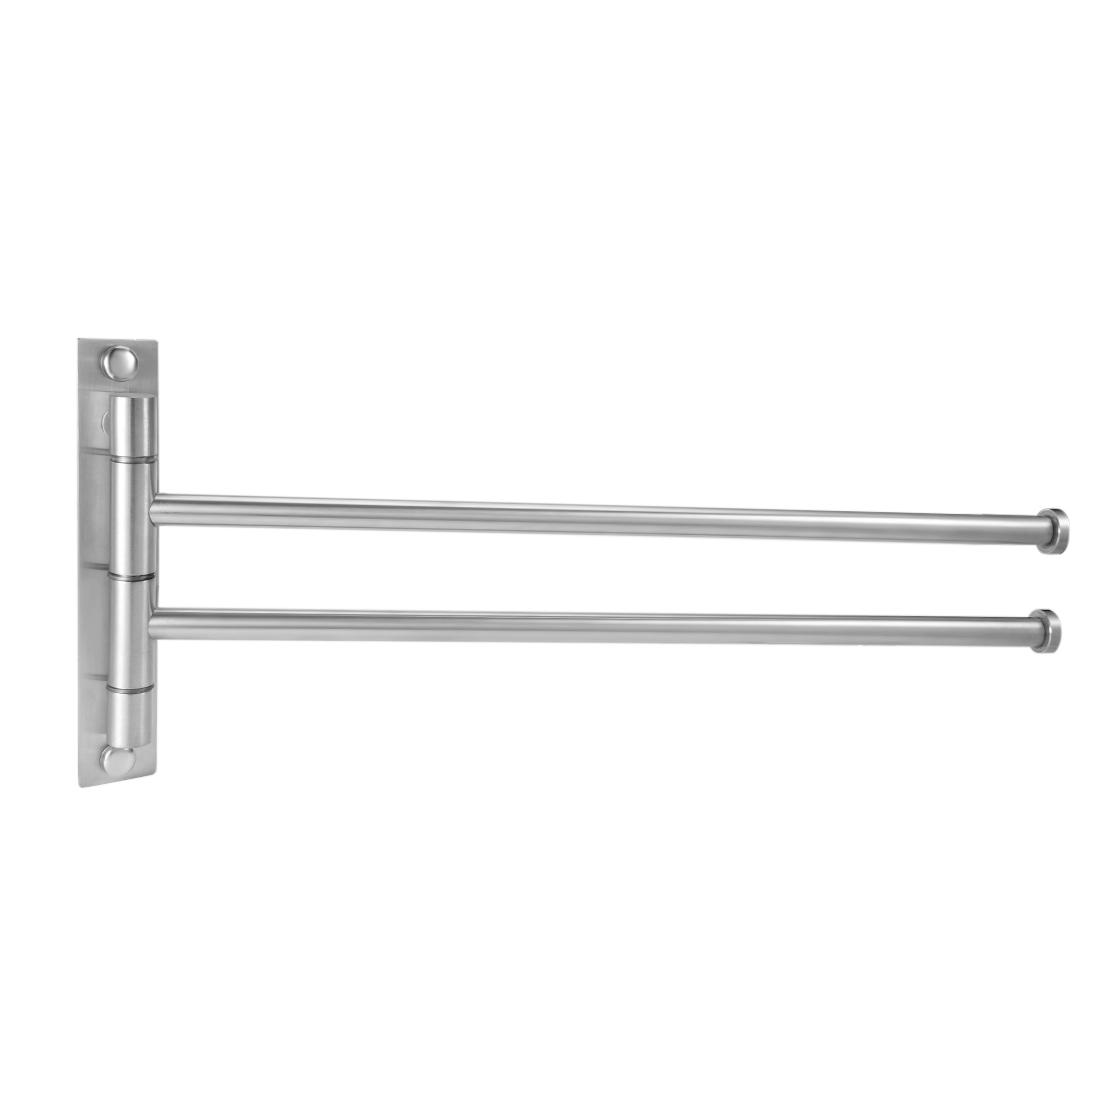 304 Stainless Steel 2 Bar Folding Arm Swivel Hanger Towel Rail Brushed Finish